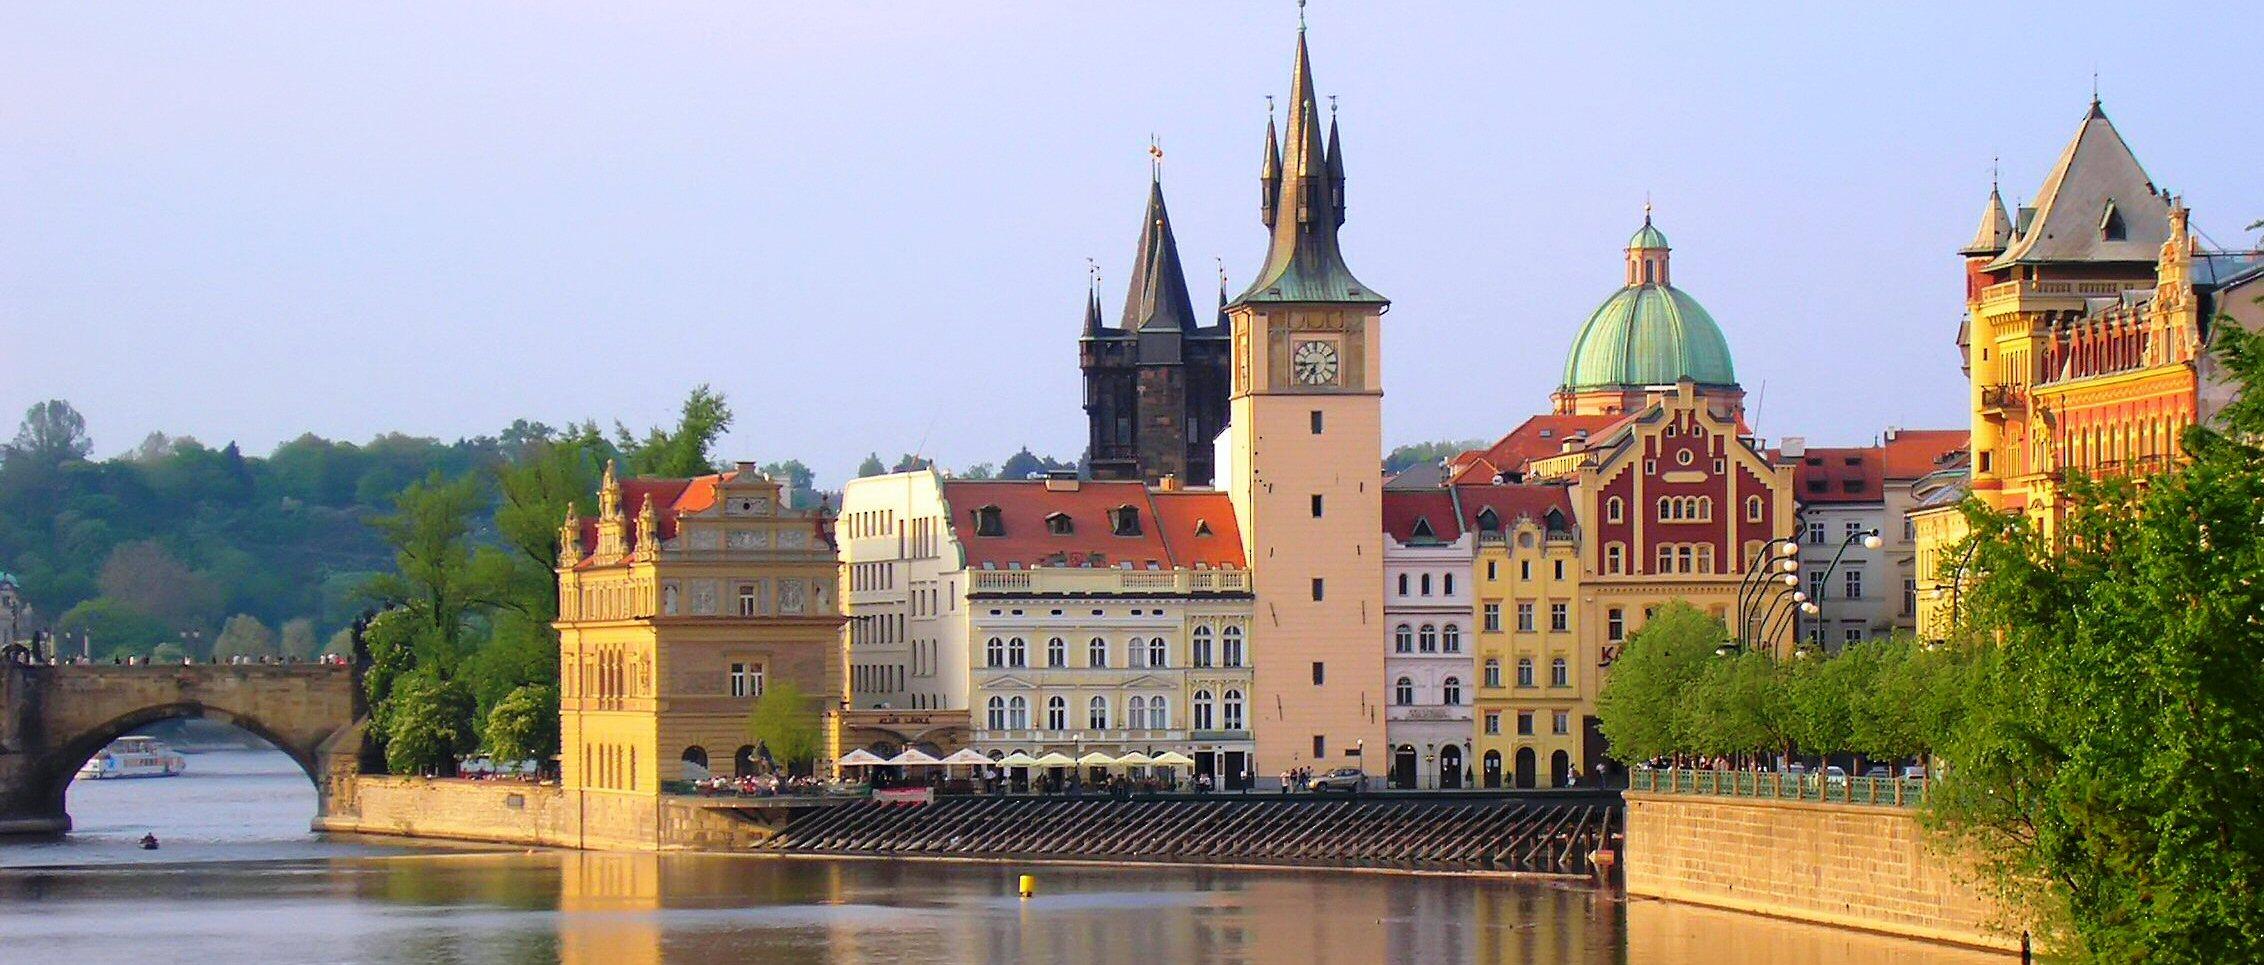 tourism in the czech republic